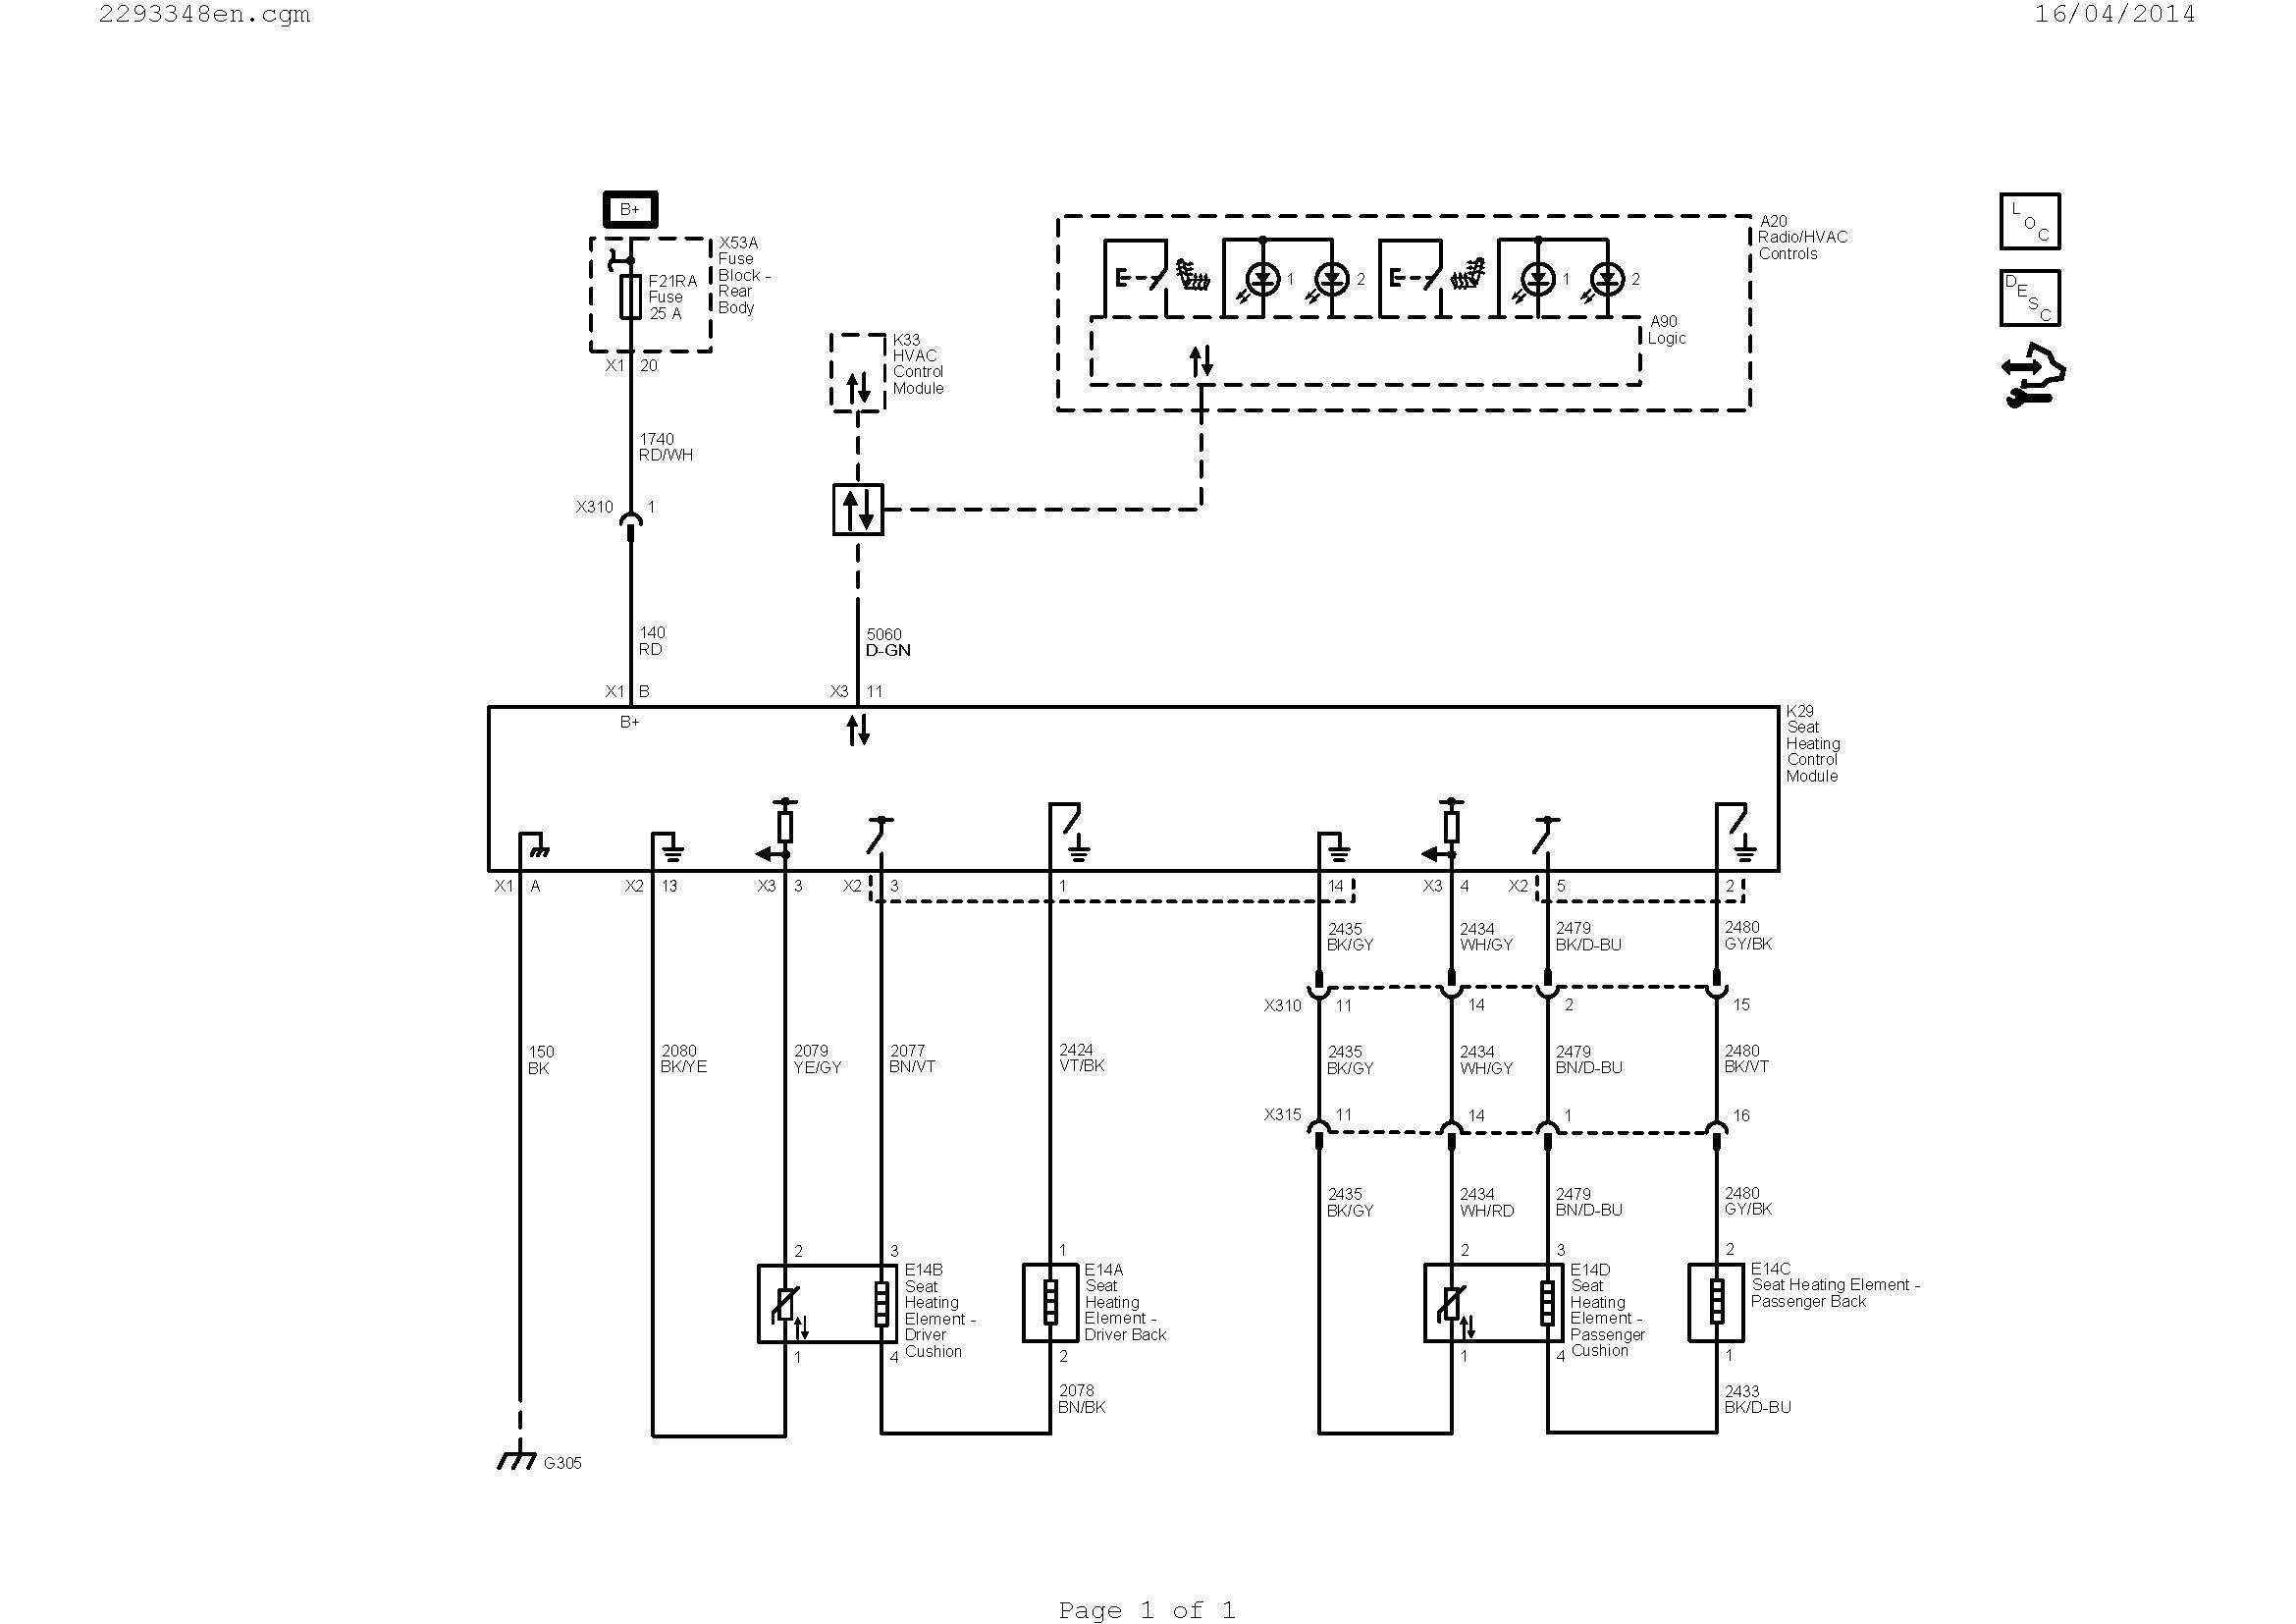 guitar jack diagram luxury wiring diagram les paul simple wiring diagram guitar fresh hvac of guitar jack diagram jpg